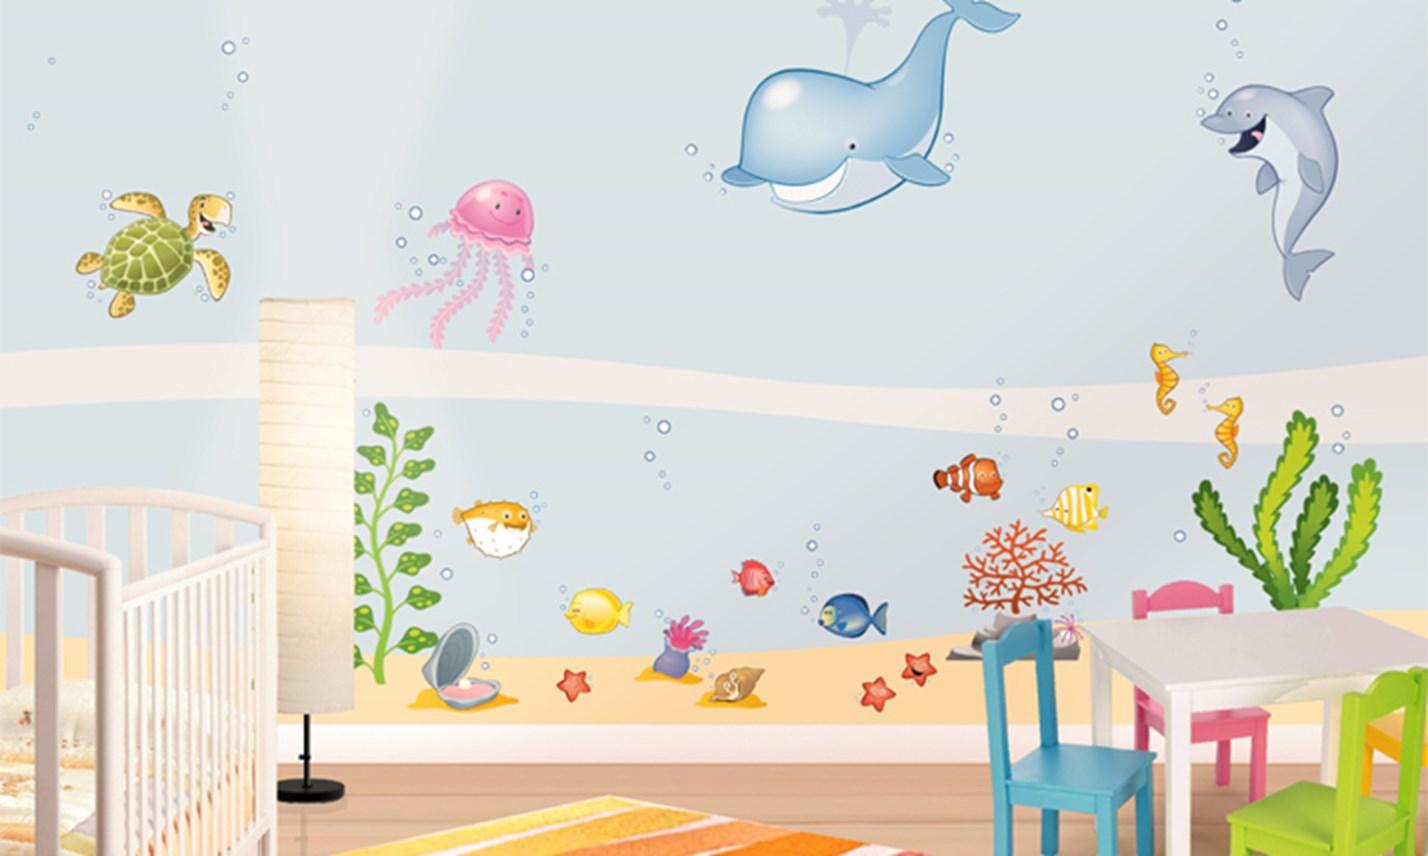 Dipinti Murali Per Camerette stickers murali bambini - cameretta in fondo al mare